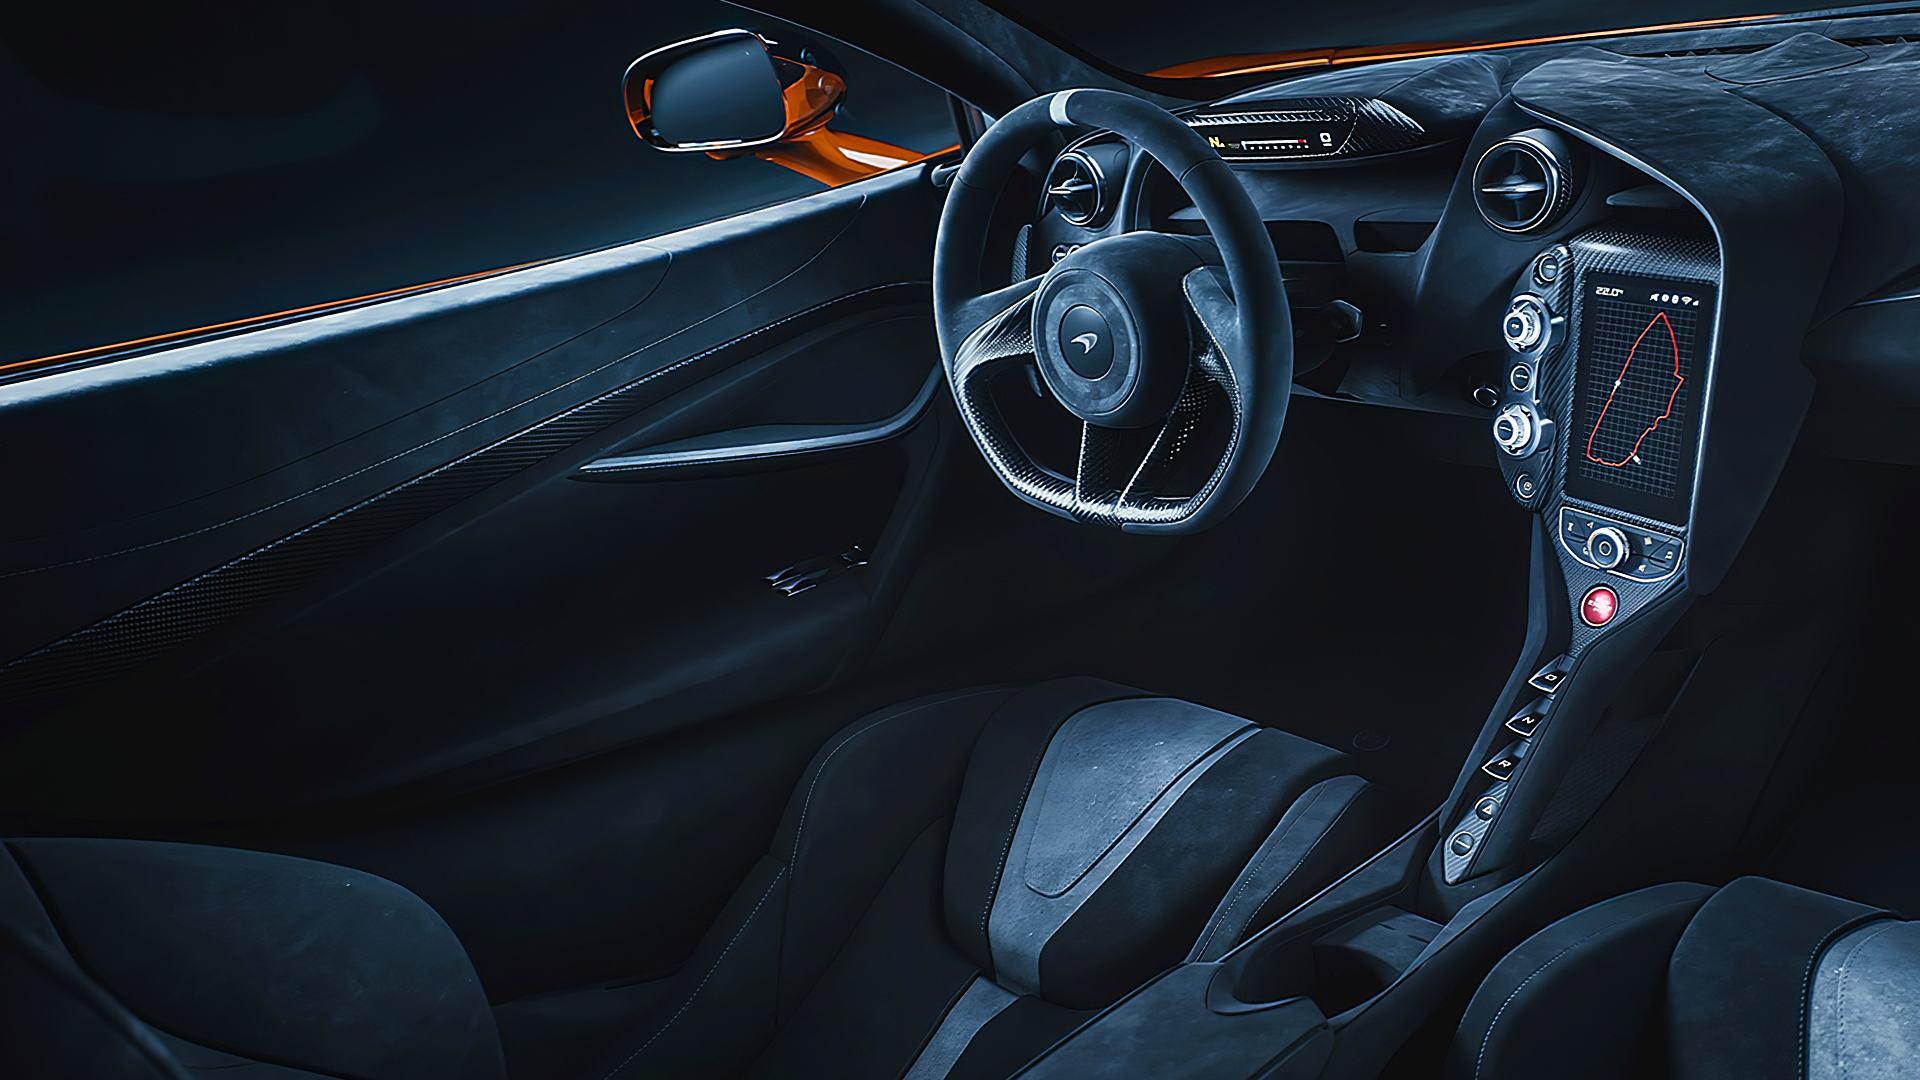 2020 McLaren 720S Le Mans Inside Interior